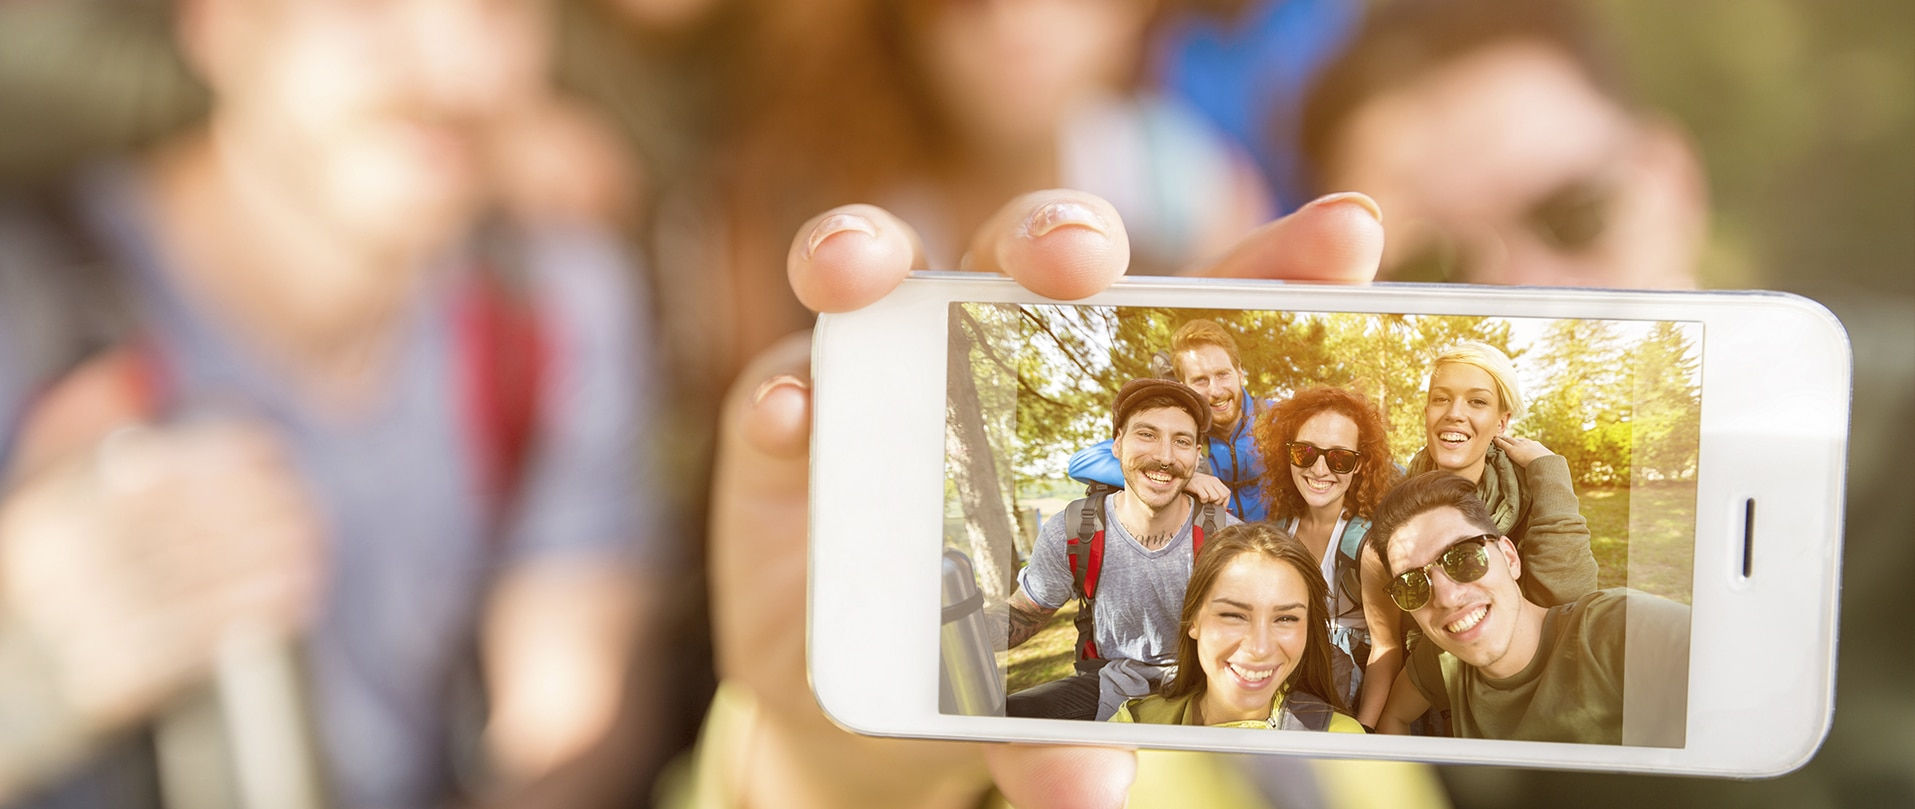 apertura-instagram-selfie-recurso